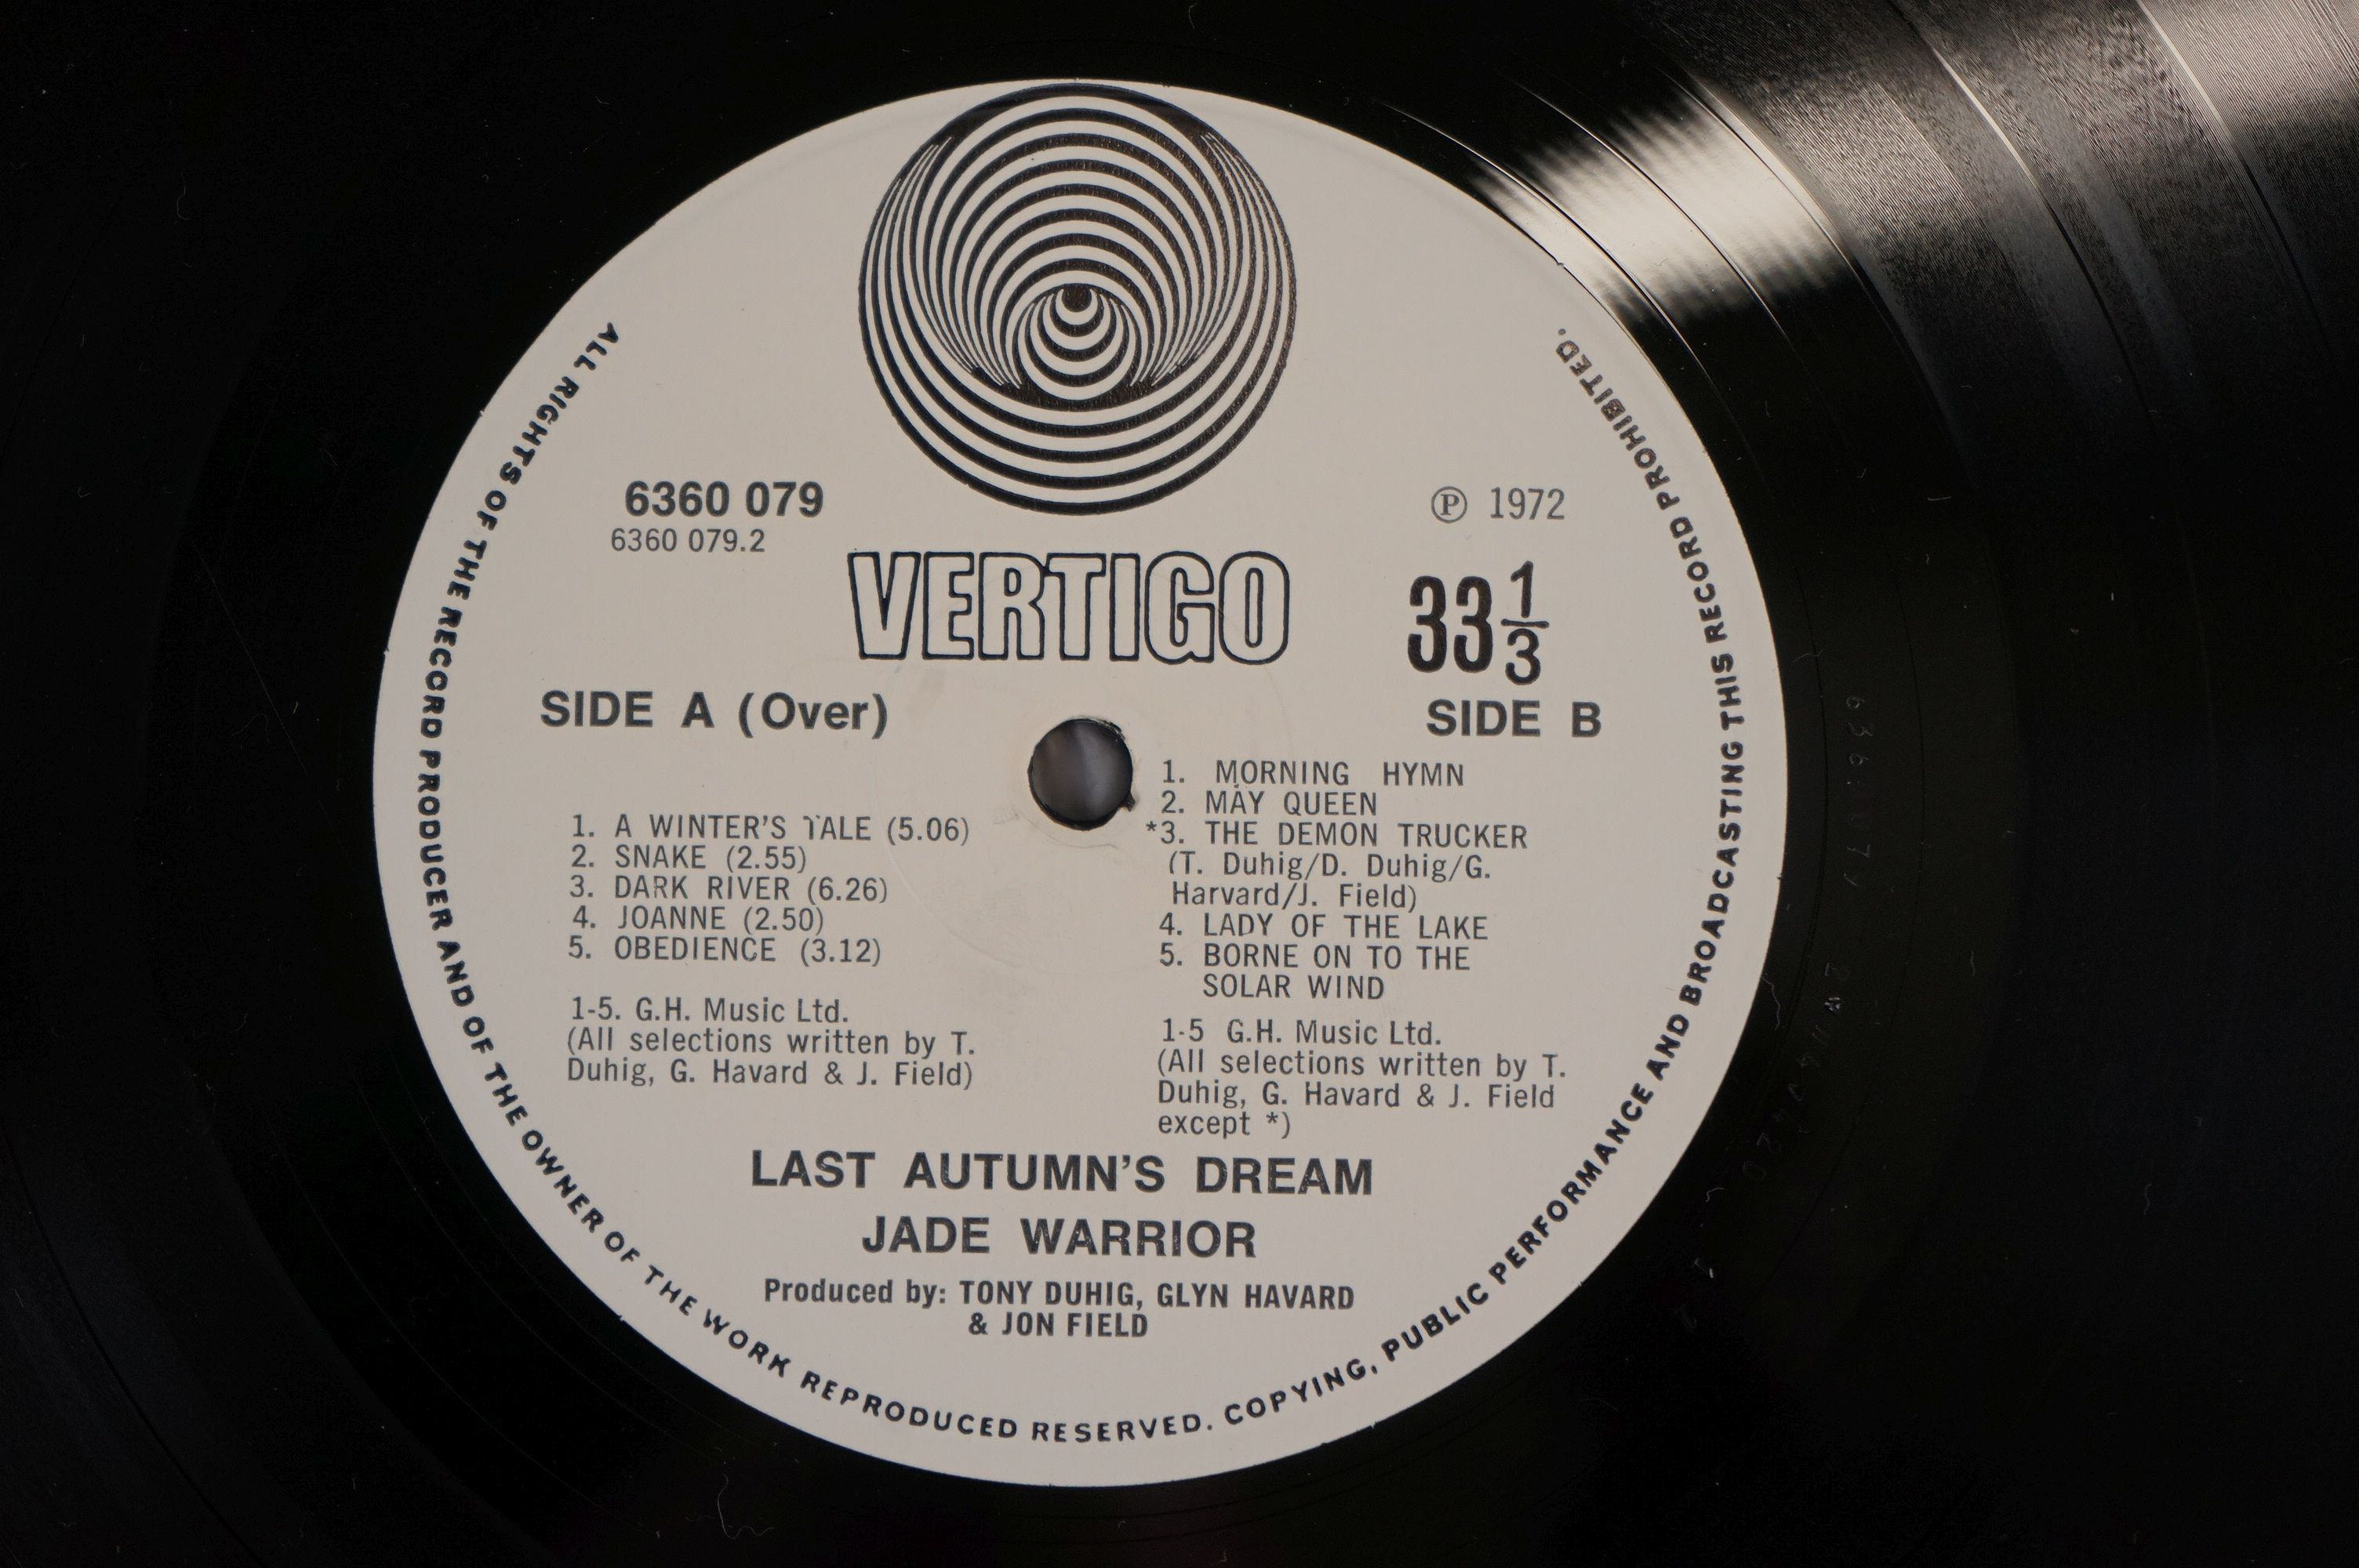 Vinyl - Four Jade Warrior LPs to include Last Autumn Dream LP on Vertigo Deluxe 6360079 gatefold - Image 9 of 9